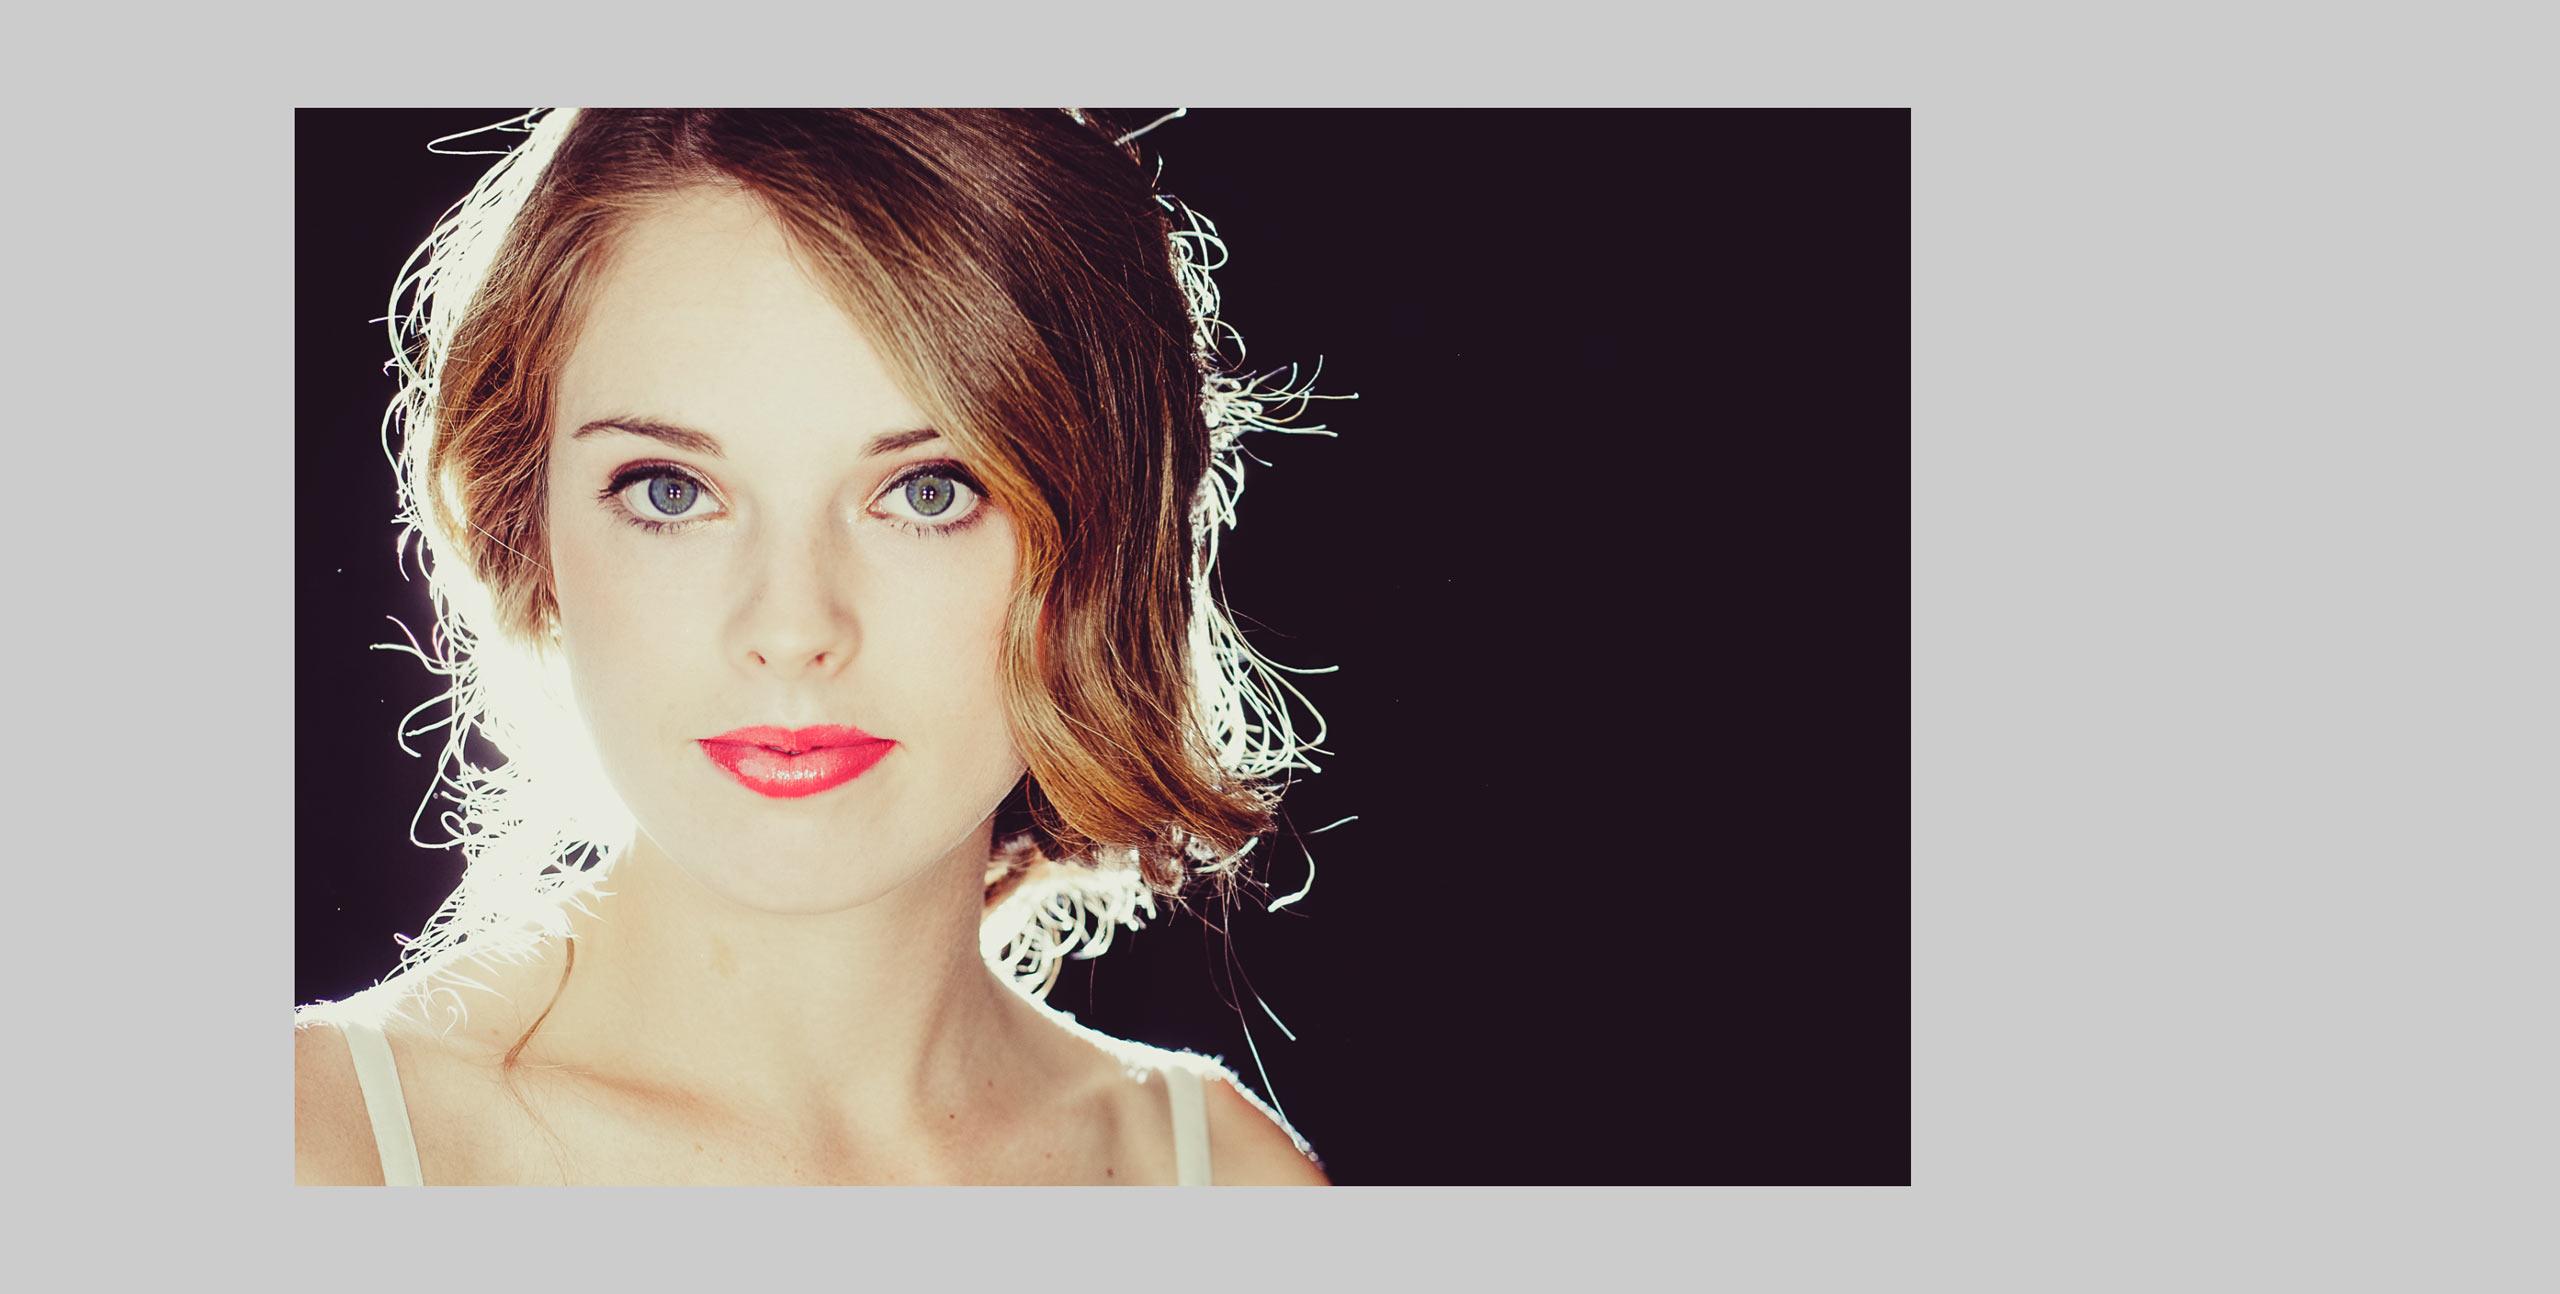 chicago senior portrait photographer claire spreads (19)